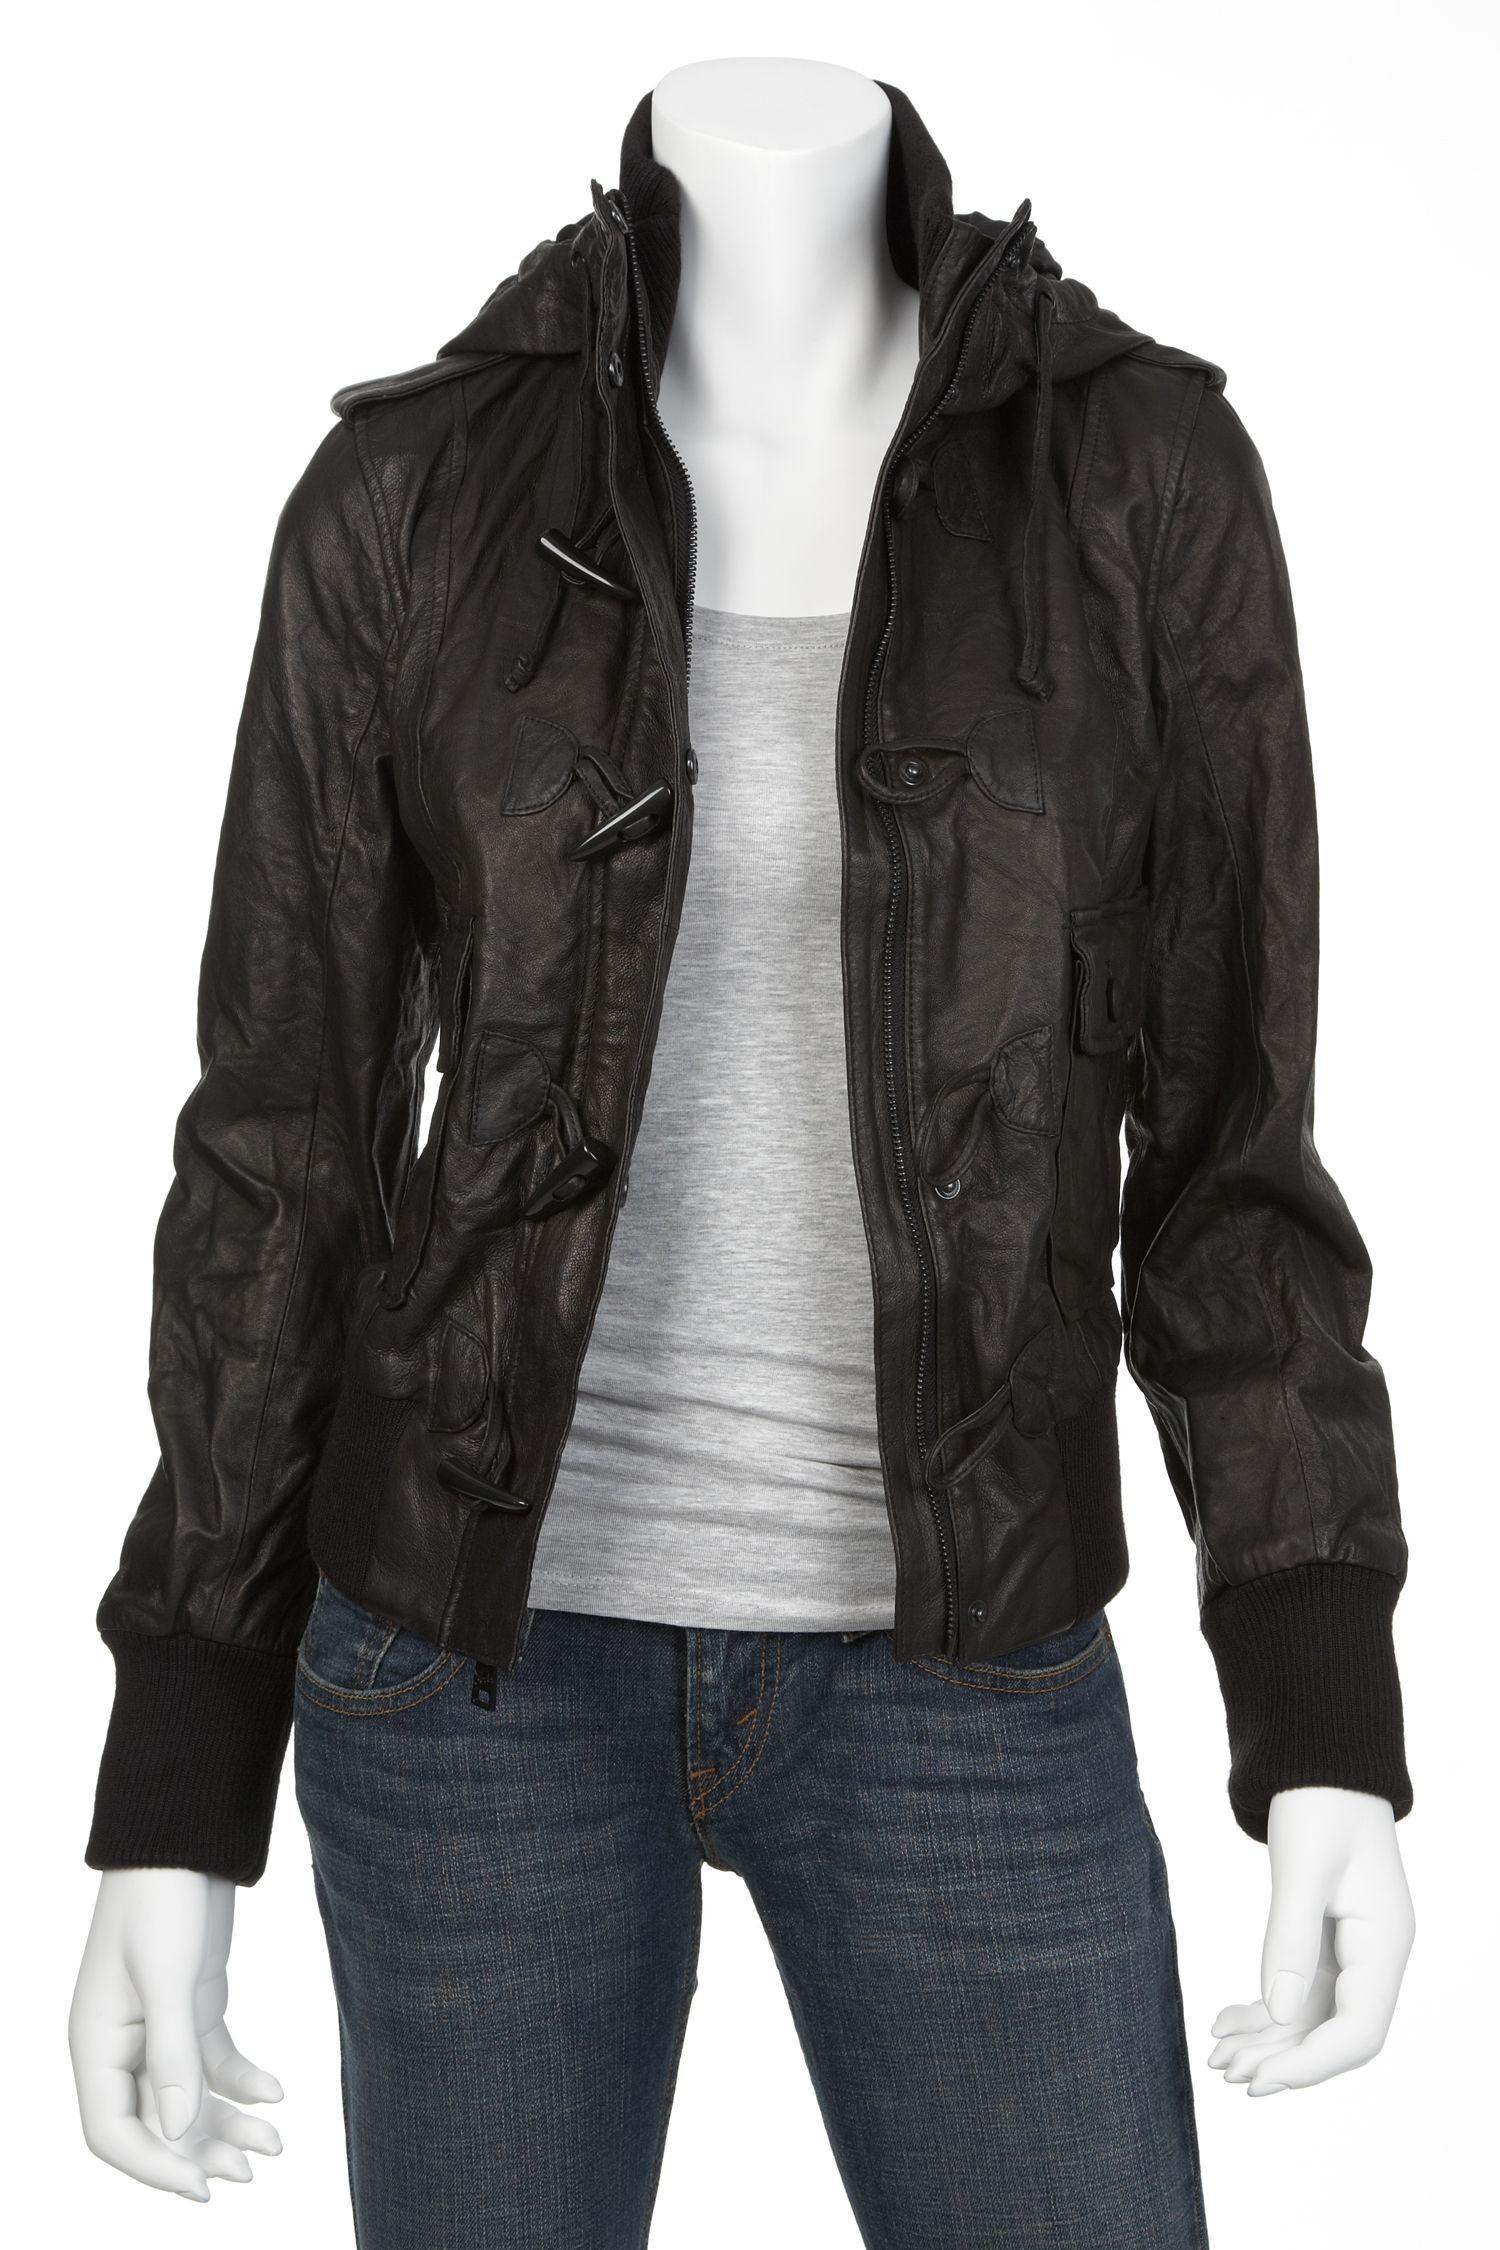 Levi's womens leather jacket, buy leather levi's jackets online ...